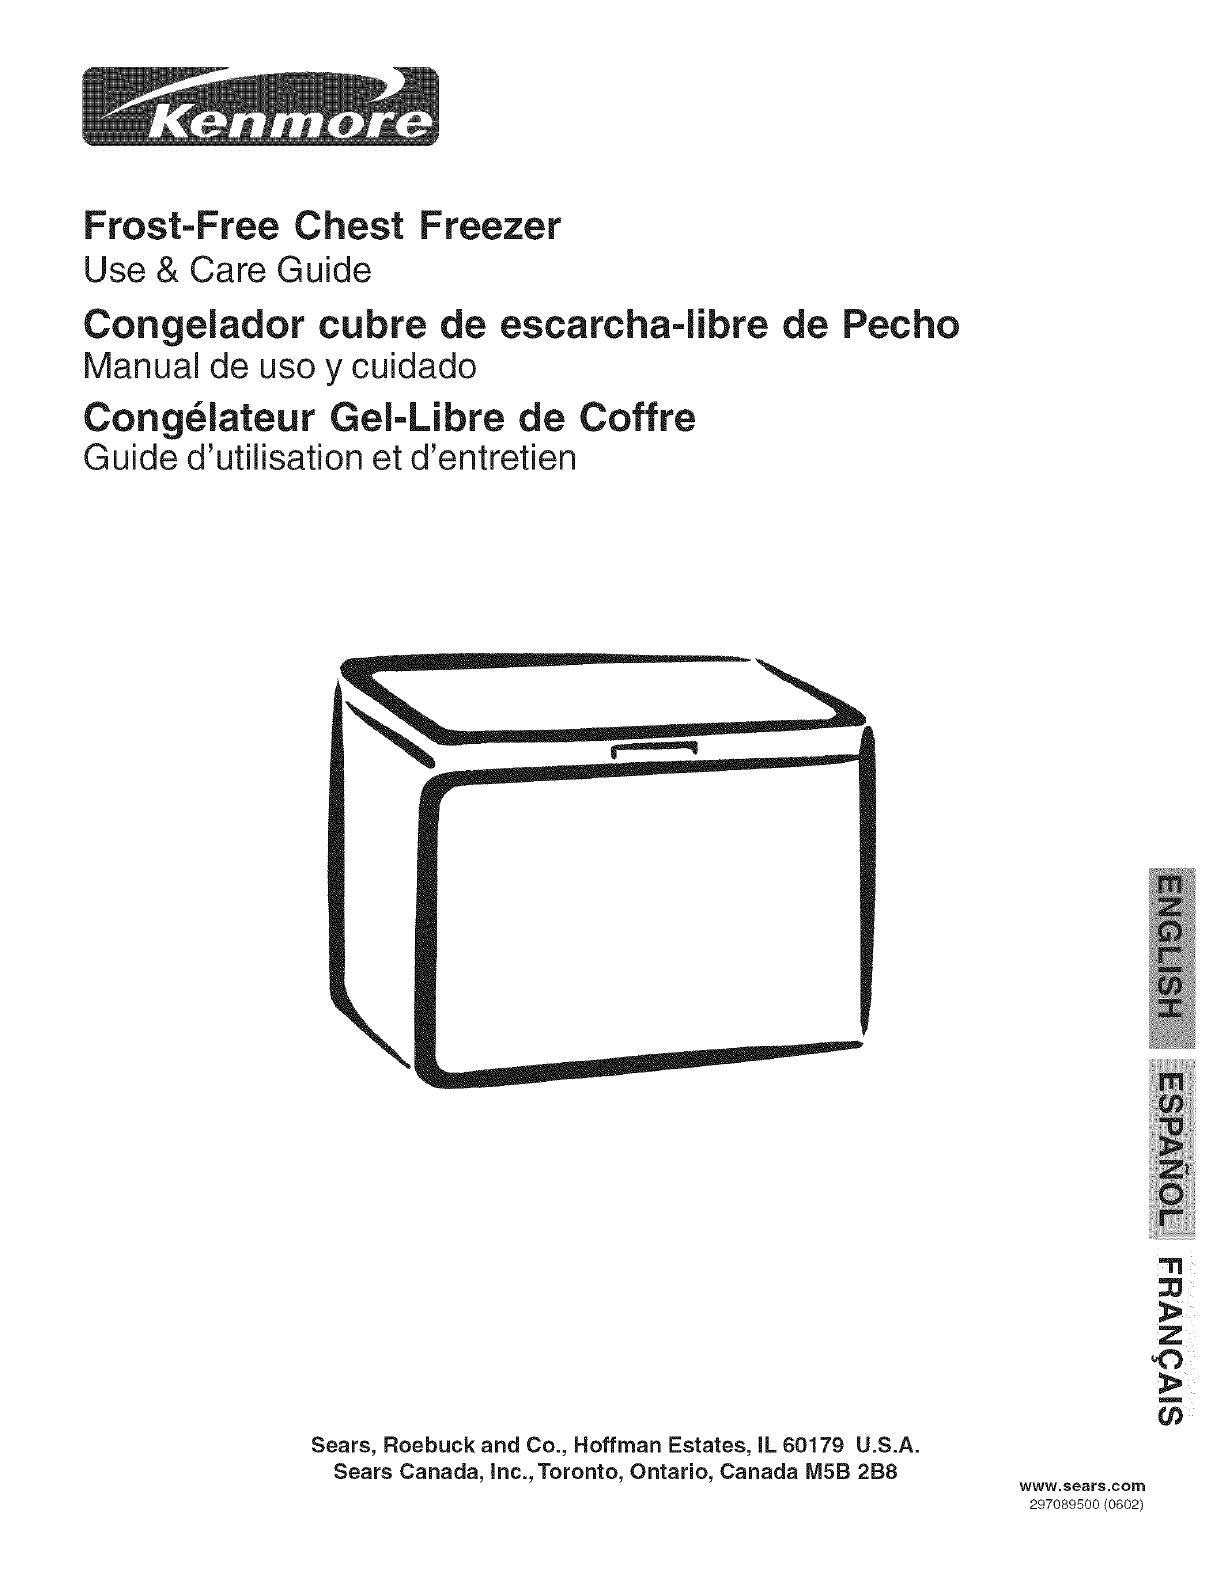 Kenmore Chest Freezer Wiring Diagram on kenmore freezer compressor wiring diagram, kenmore dishwasher parts, kenmore elite chest freezer, kenmore schematic diagram,